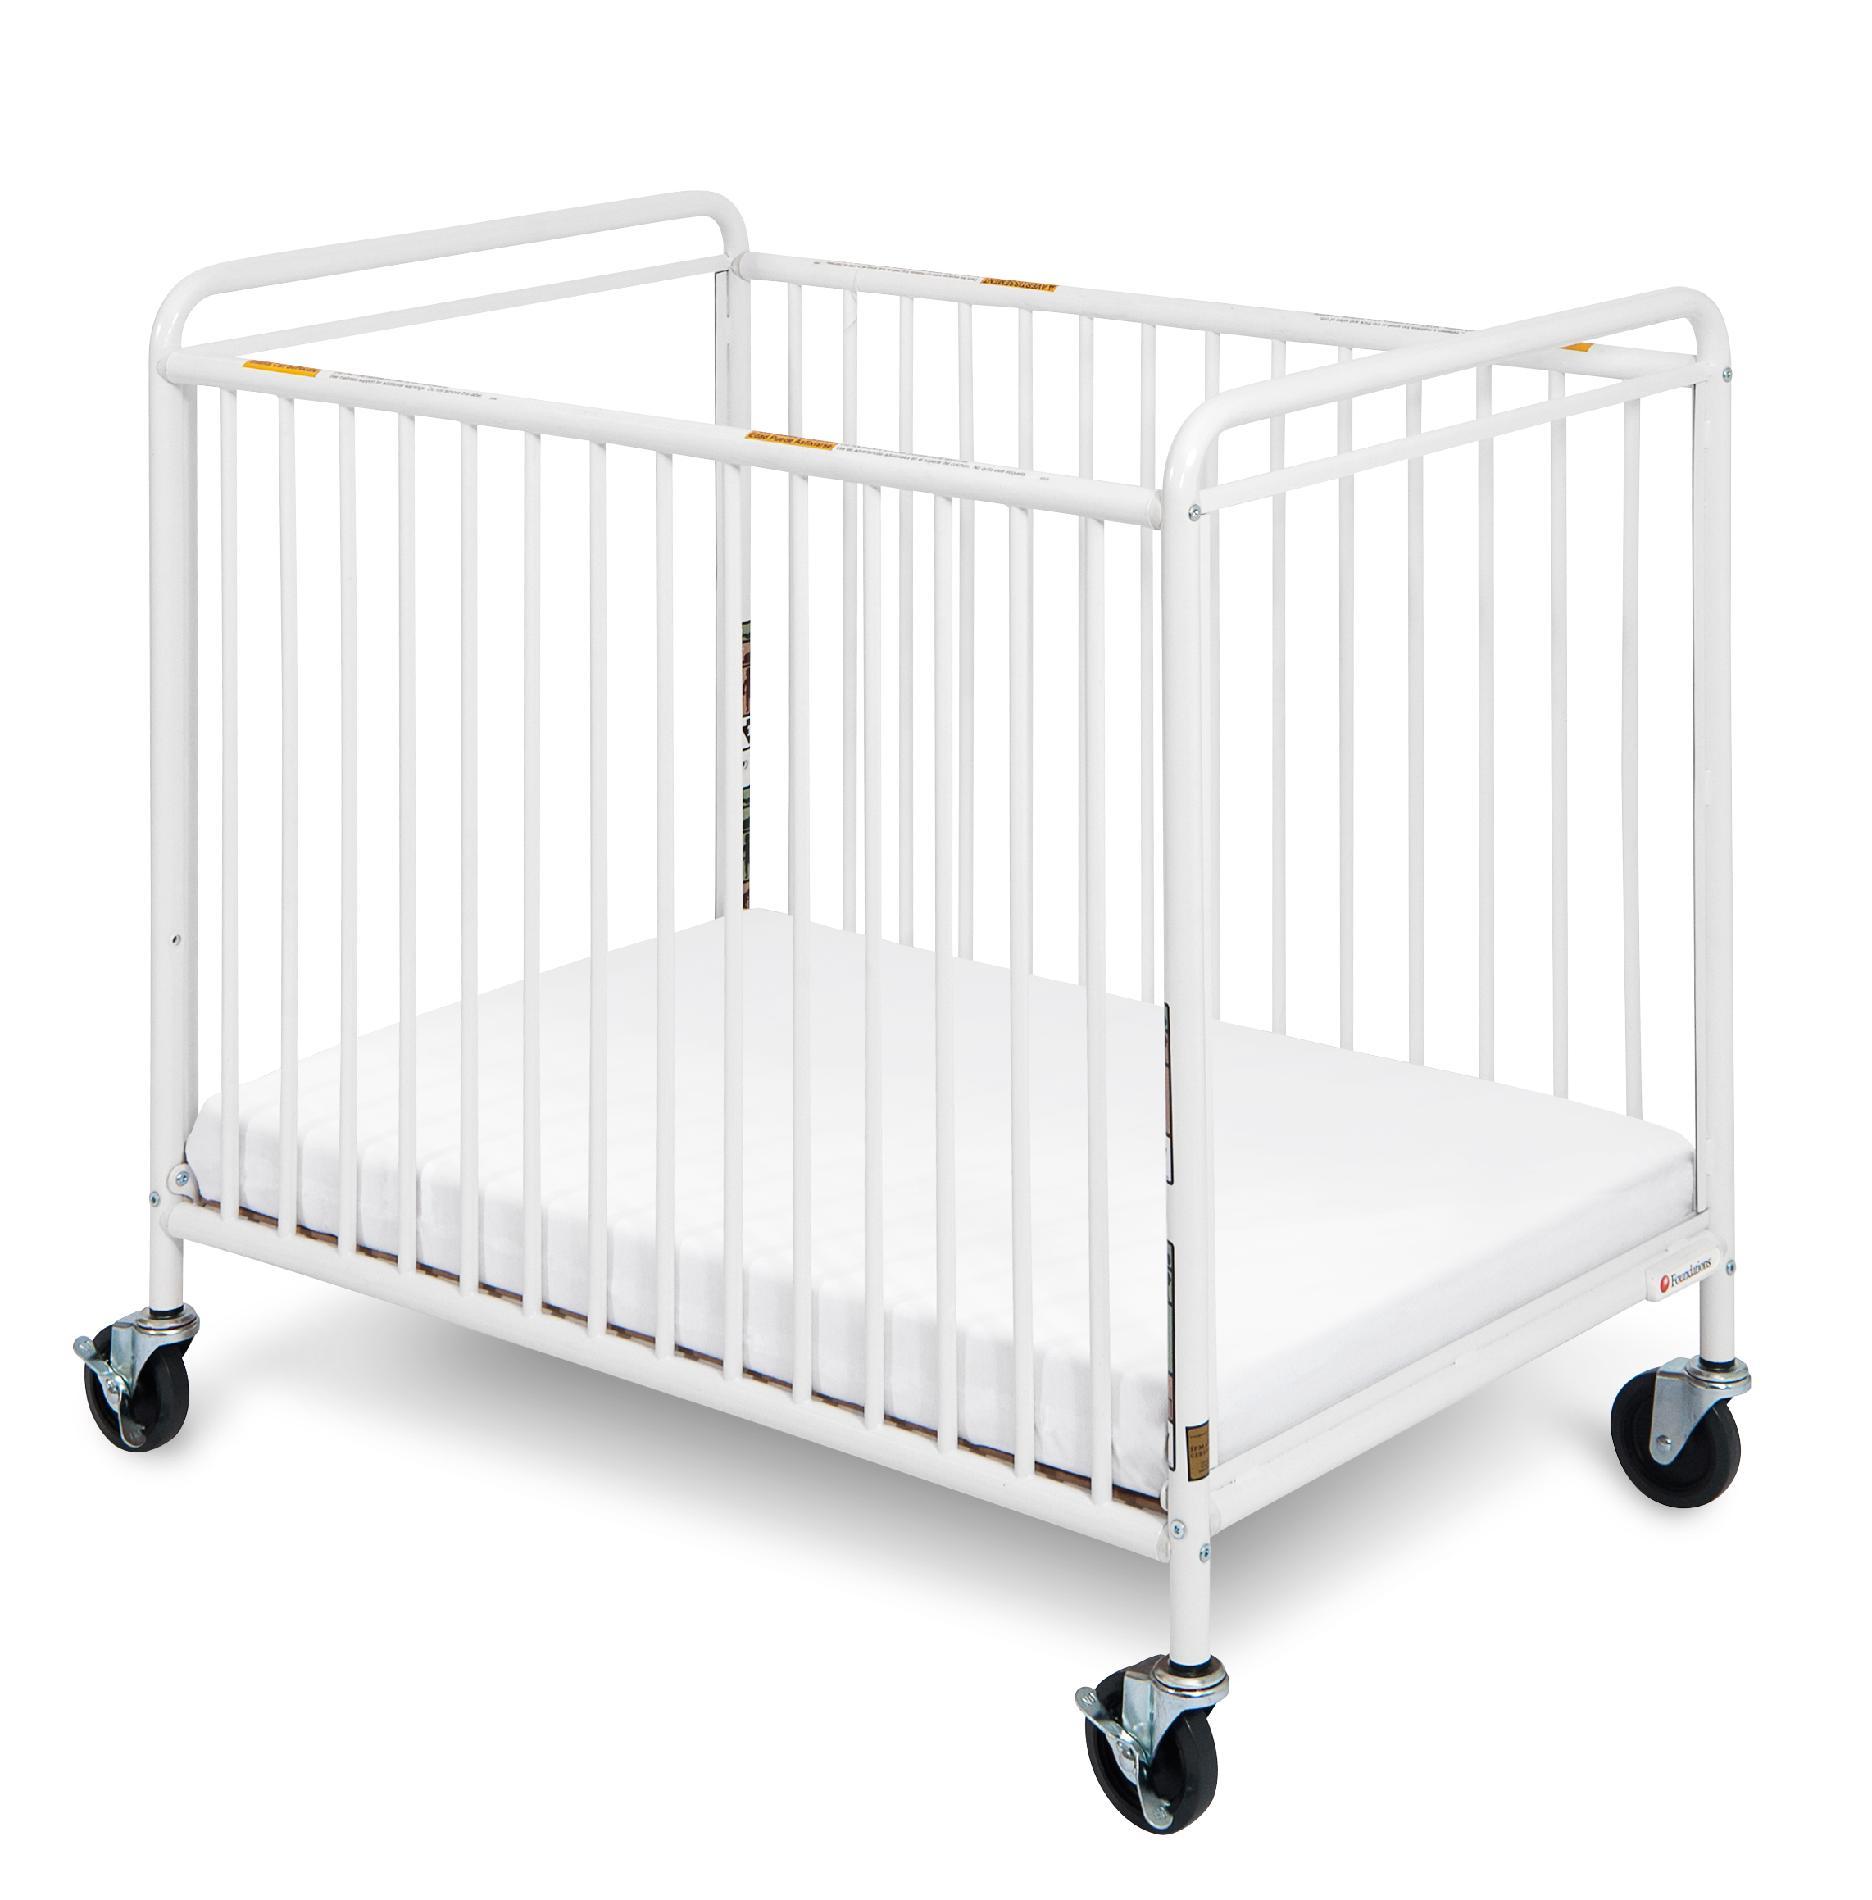 Chelsea Euro Clear Choice Mini Non-folding Crib with 4